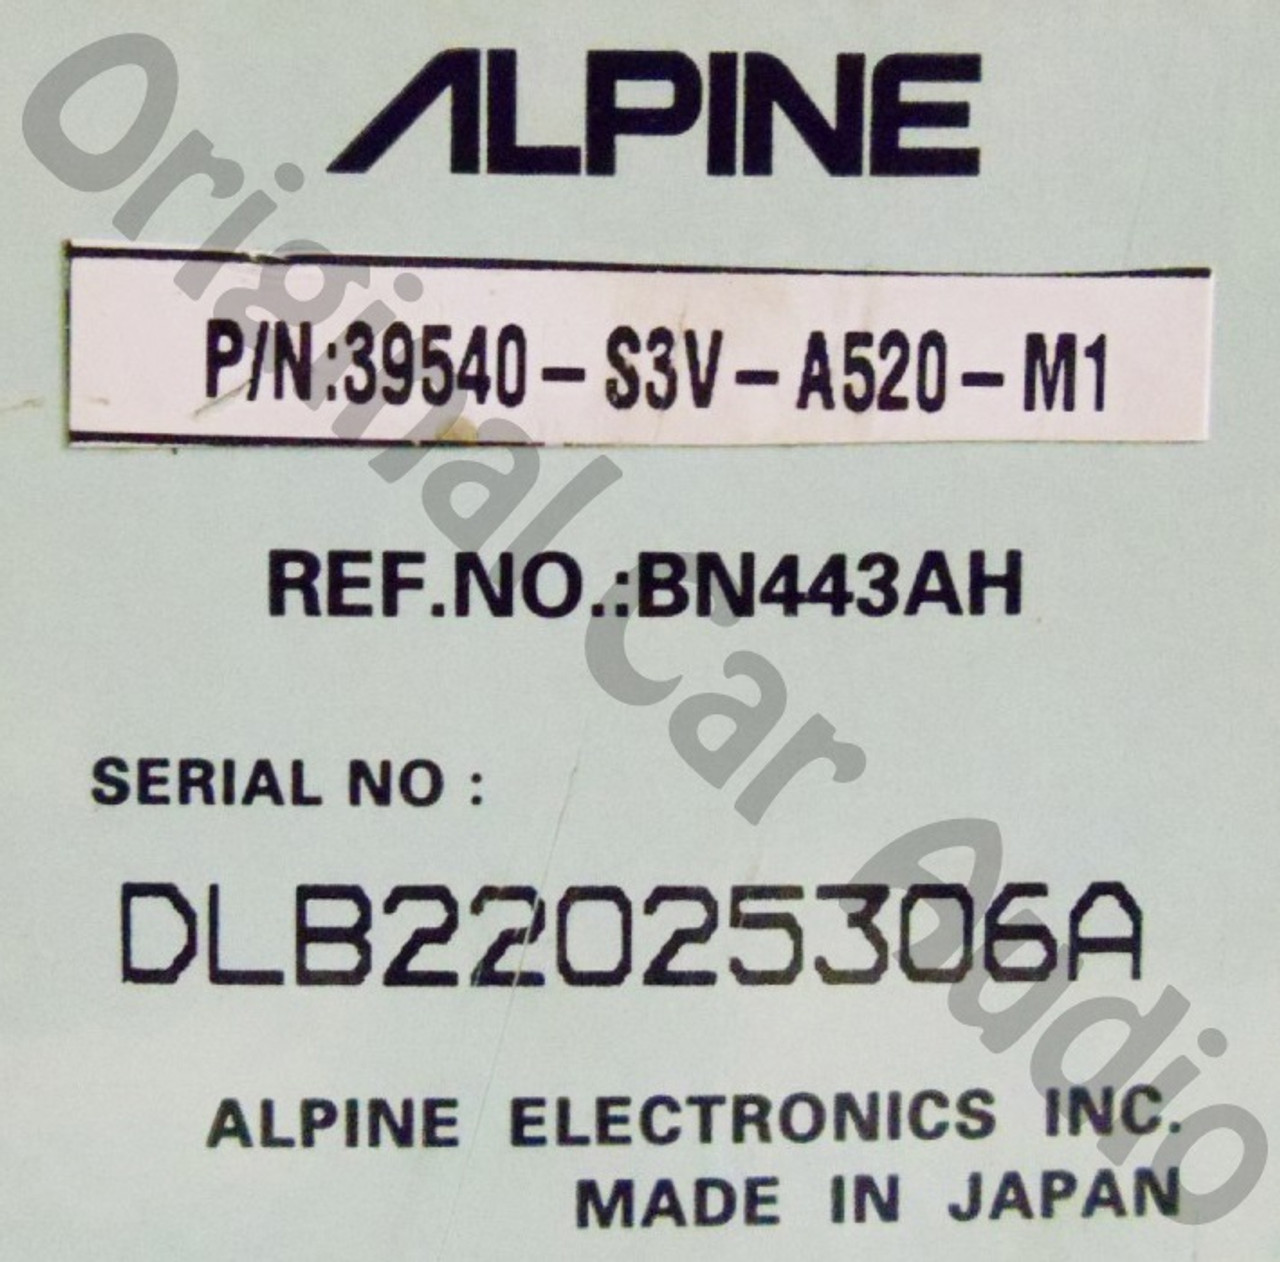 Remanufactured By ALPINE Acura MDX Navigation DVD Player